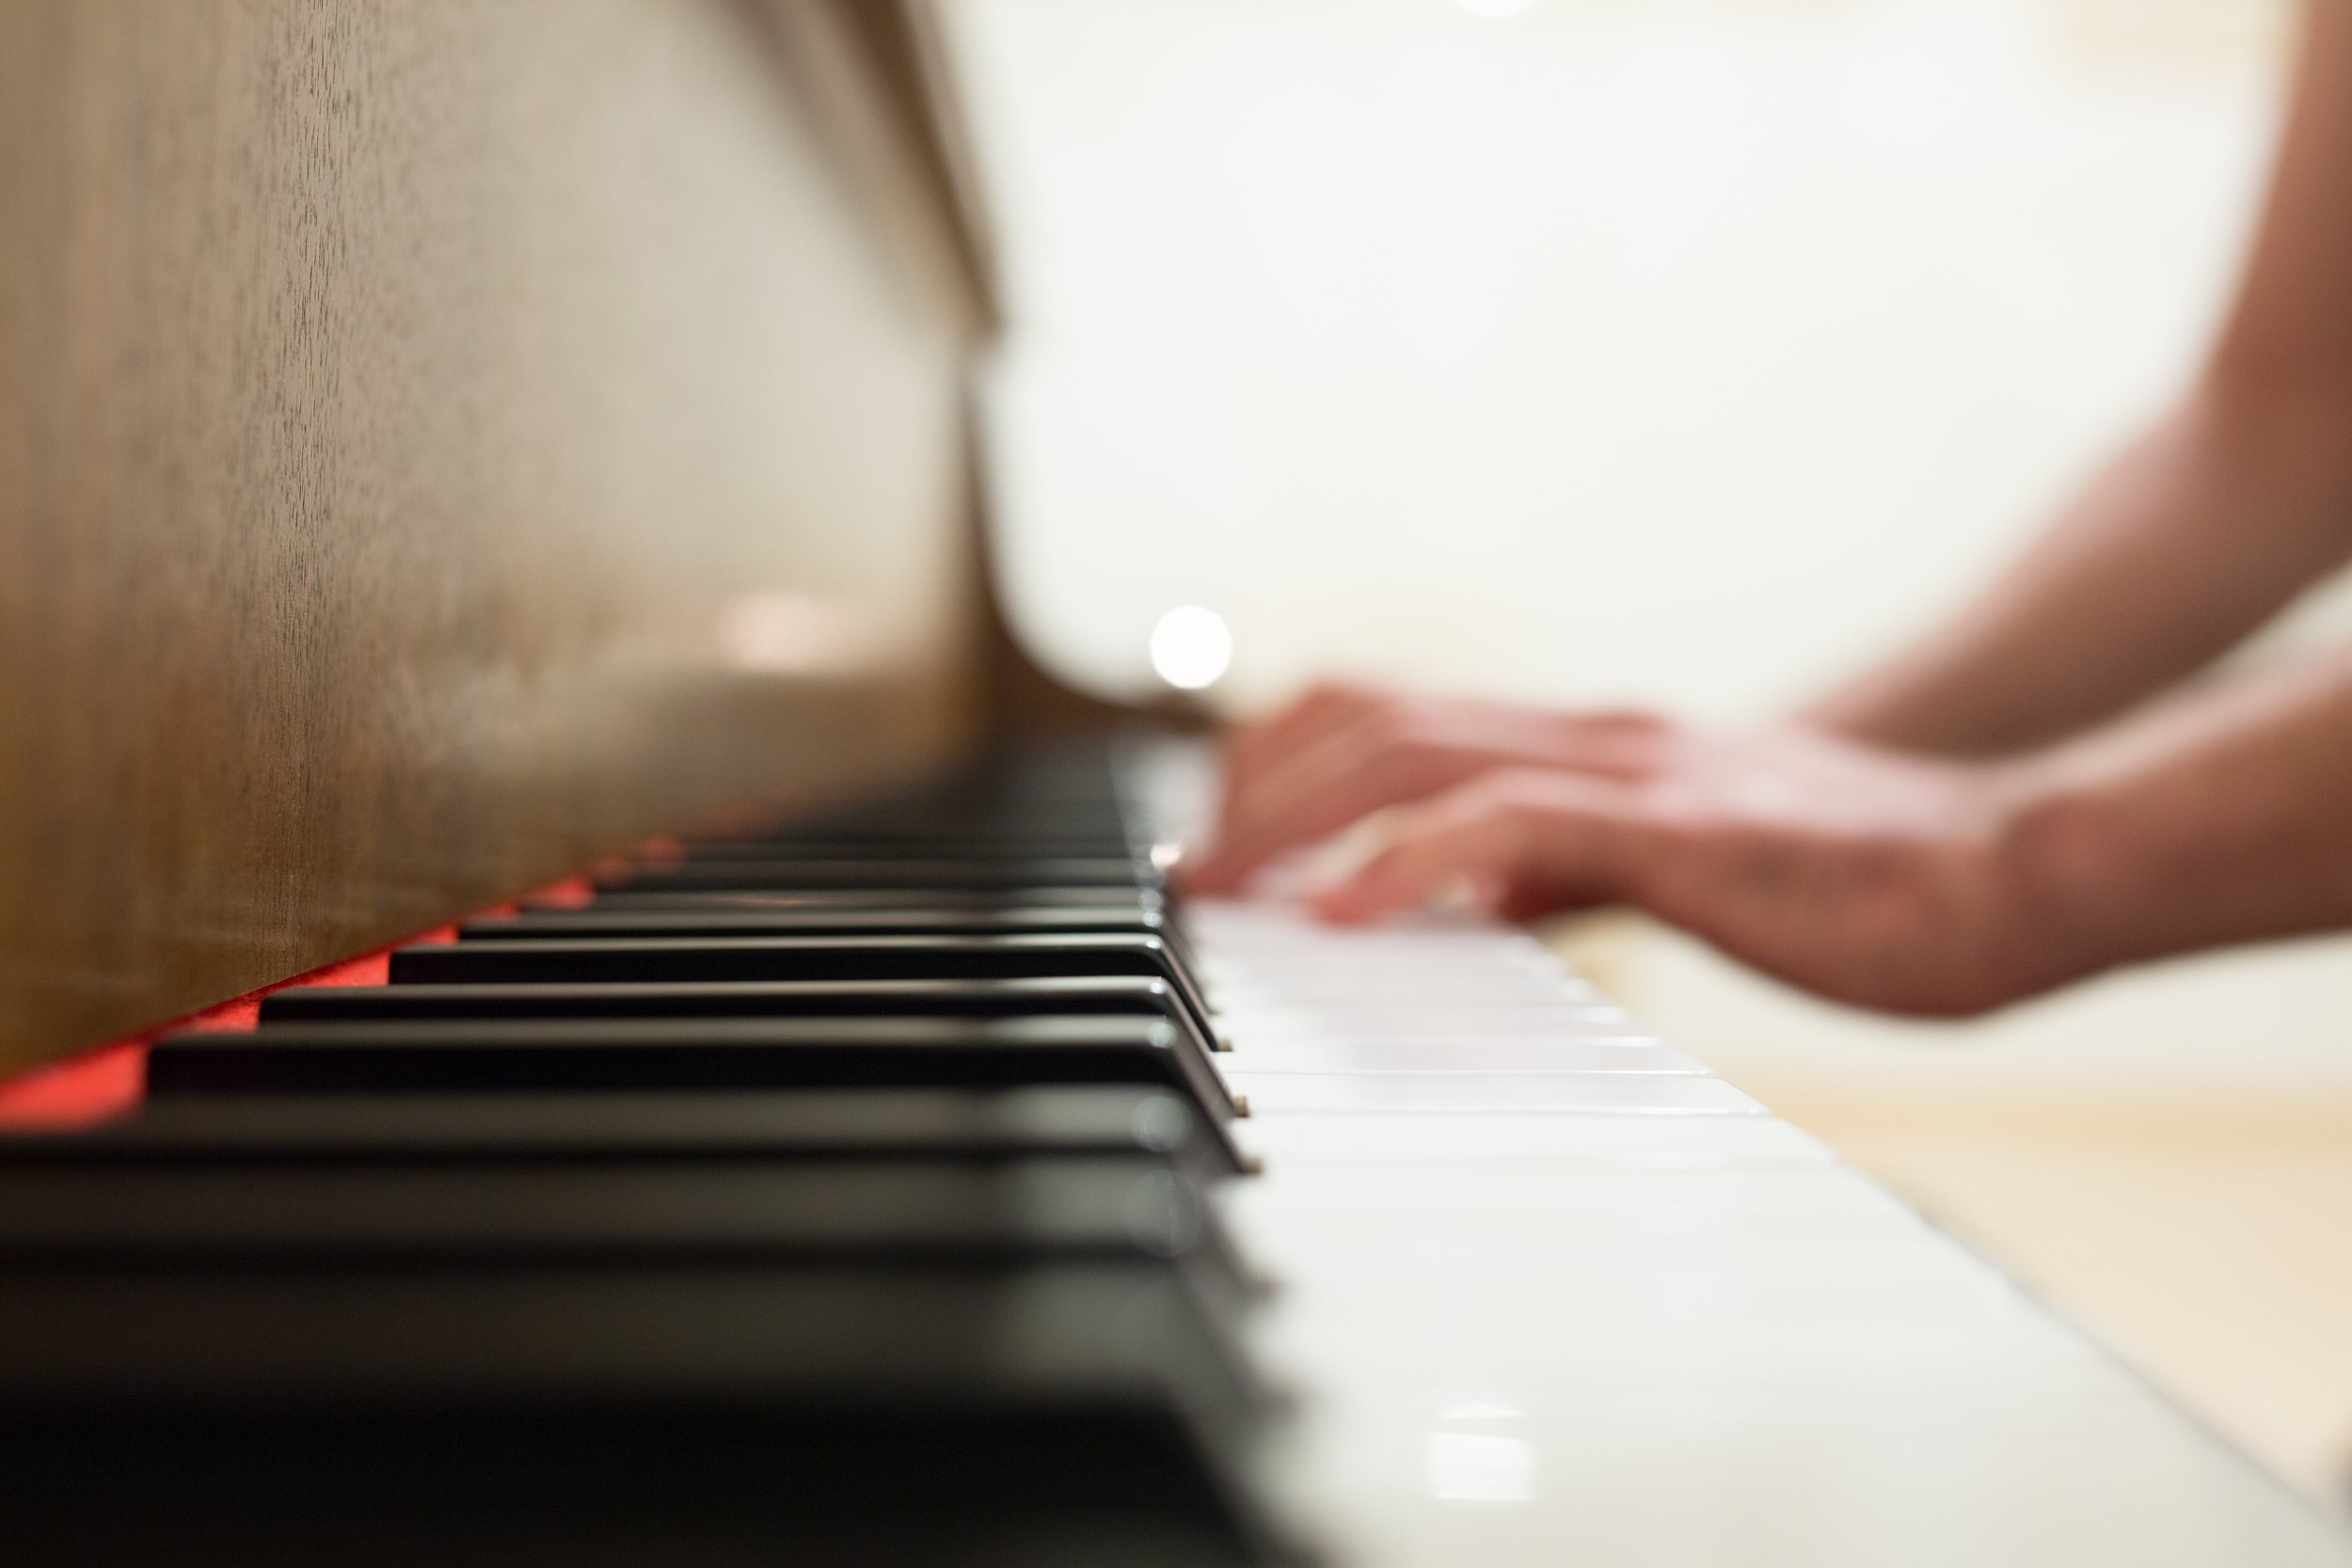 hands-keyboard-music-34583.jpg